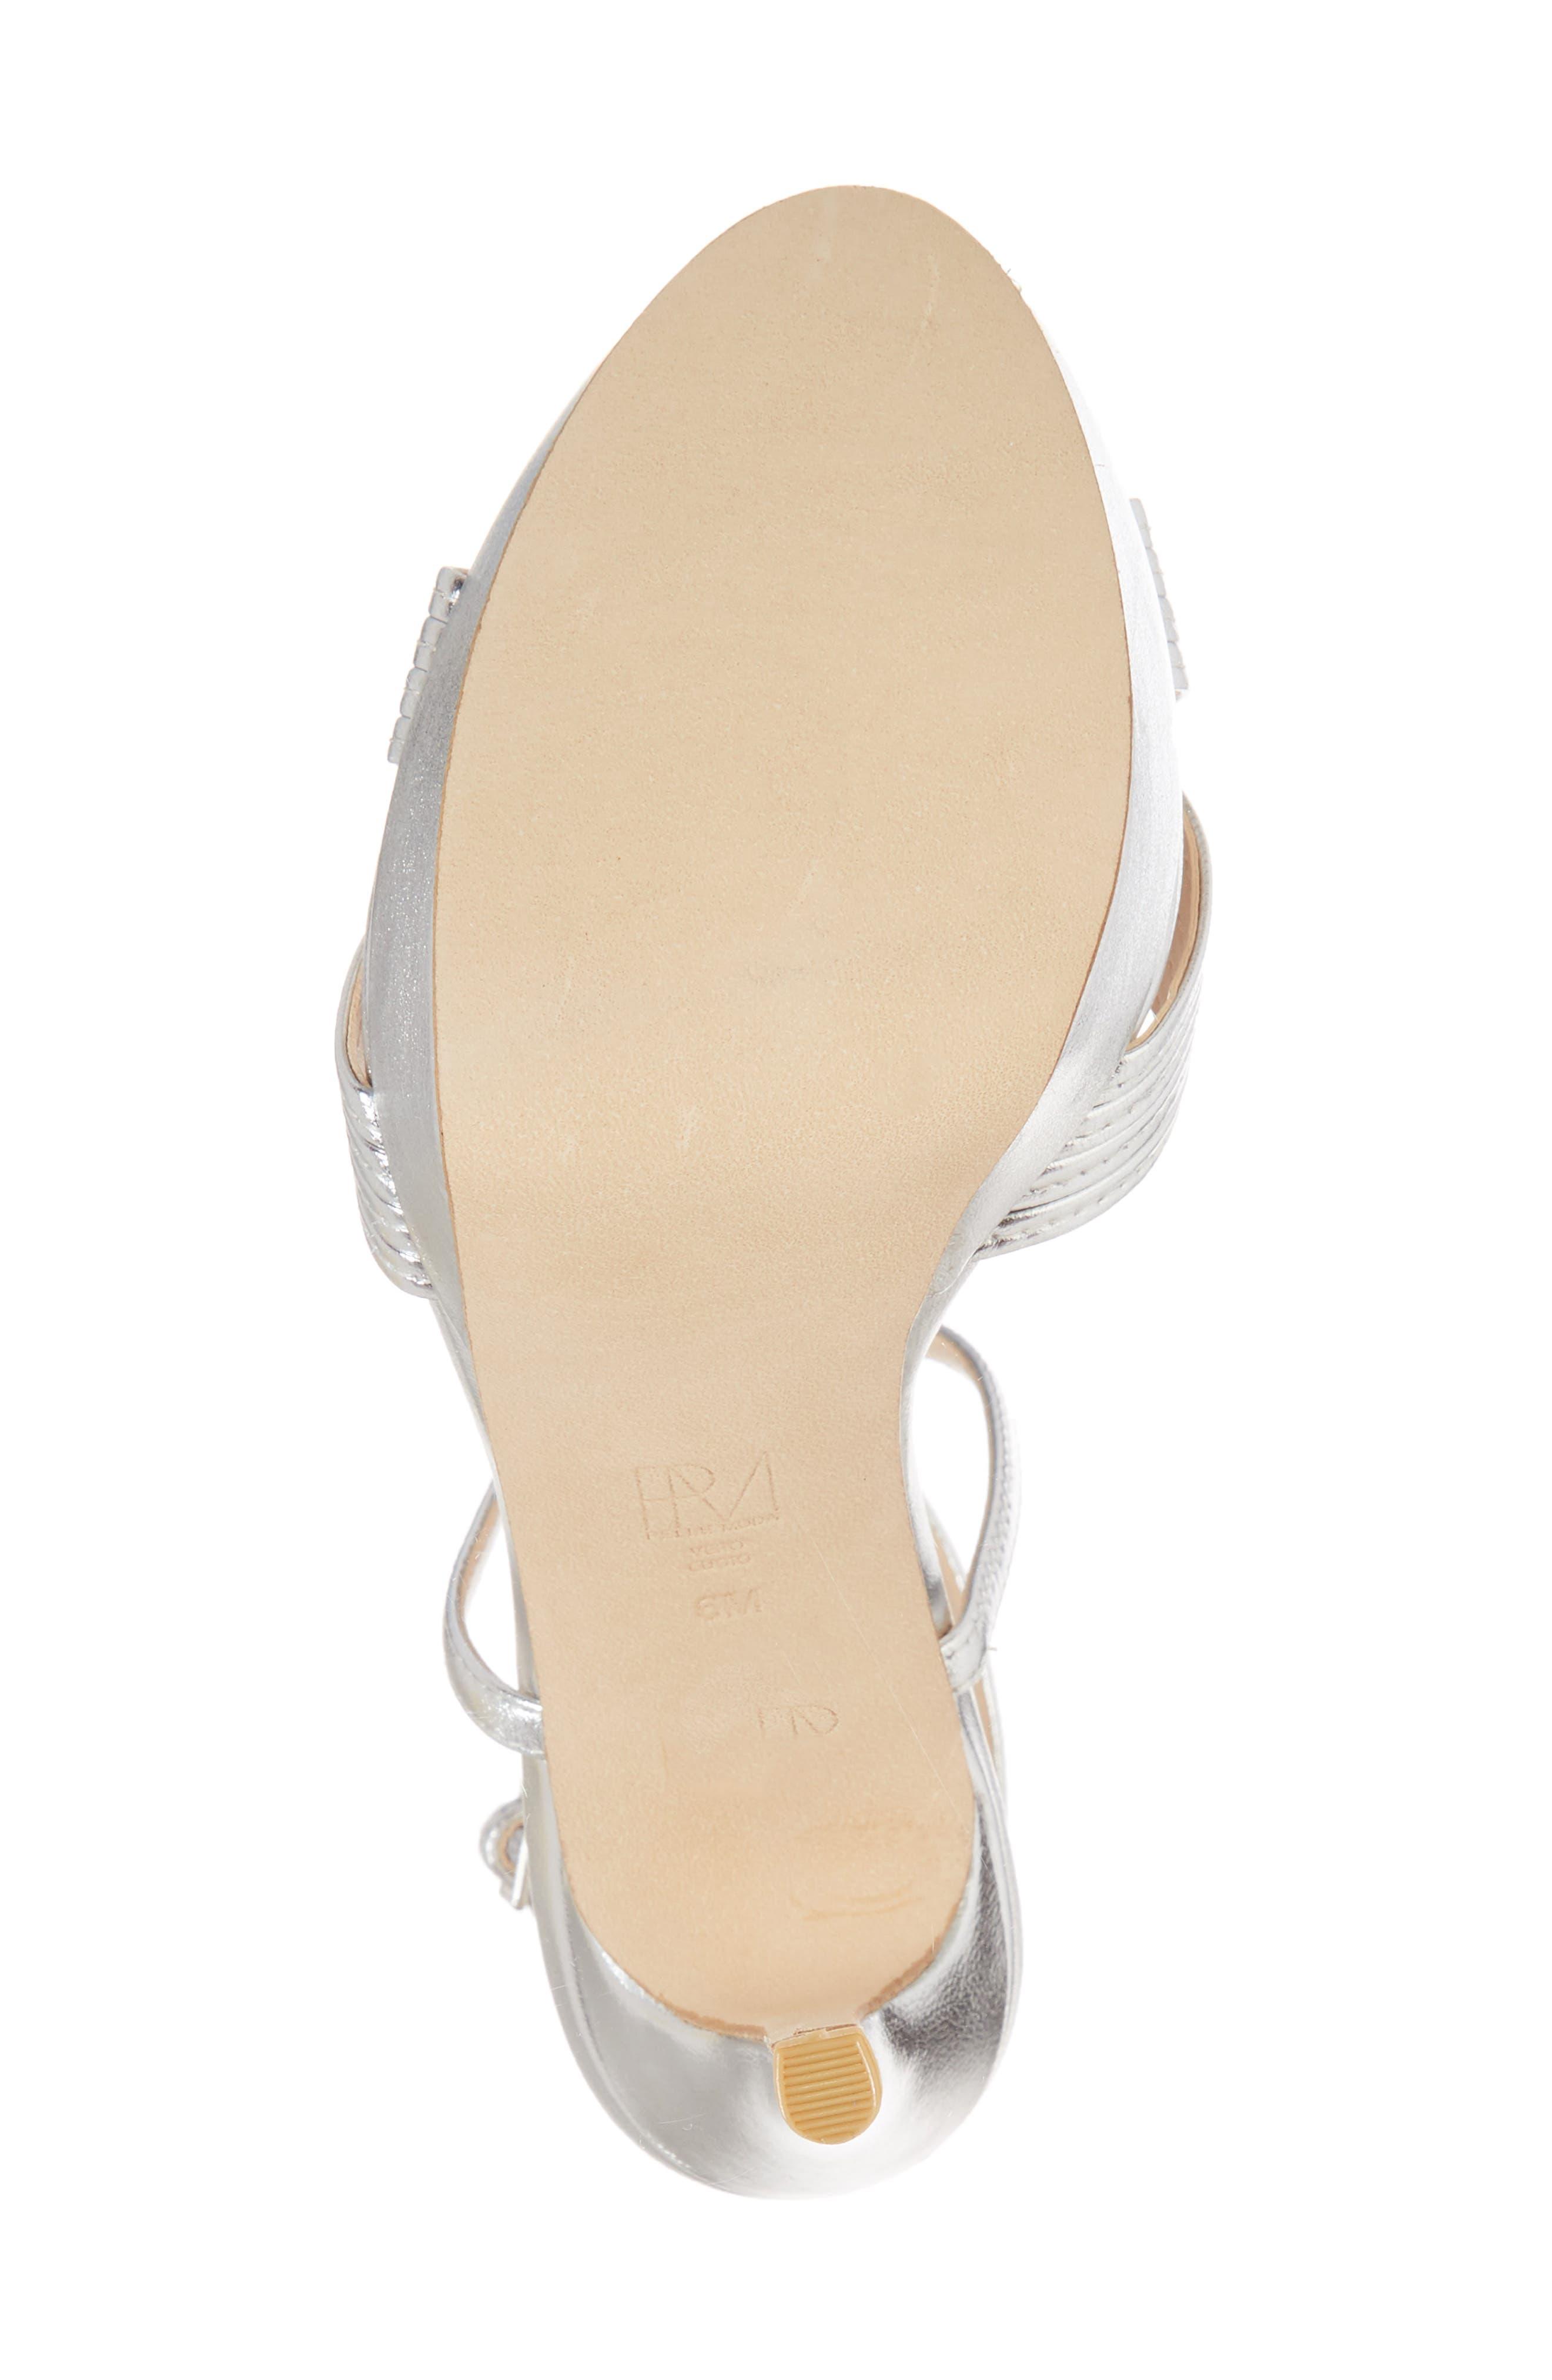 Olson Platform Sandal,                             Alternate thumbnail 6, color,                             SILVER LEATHER